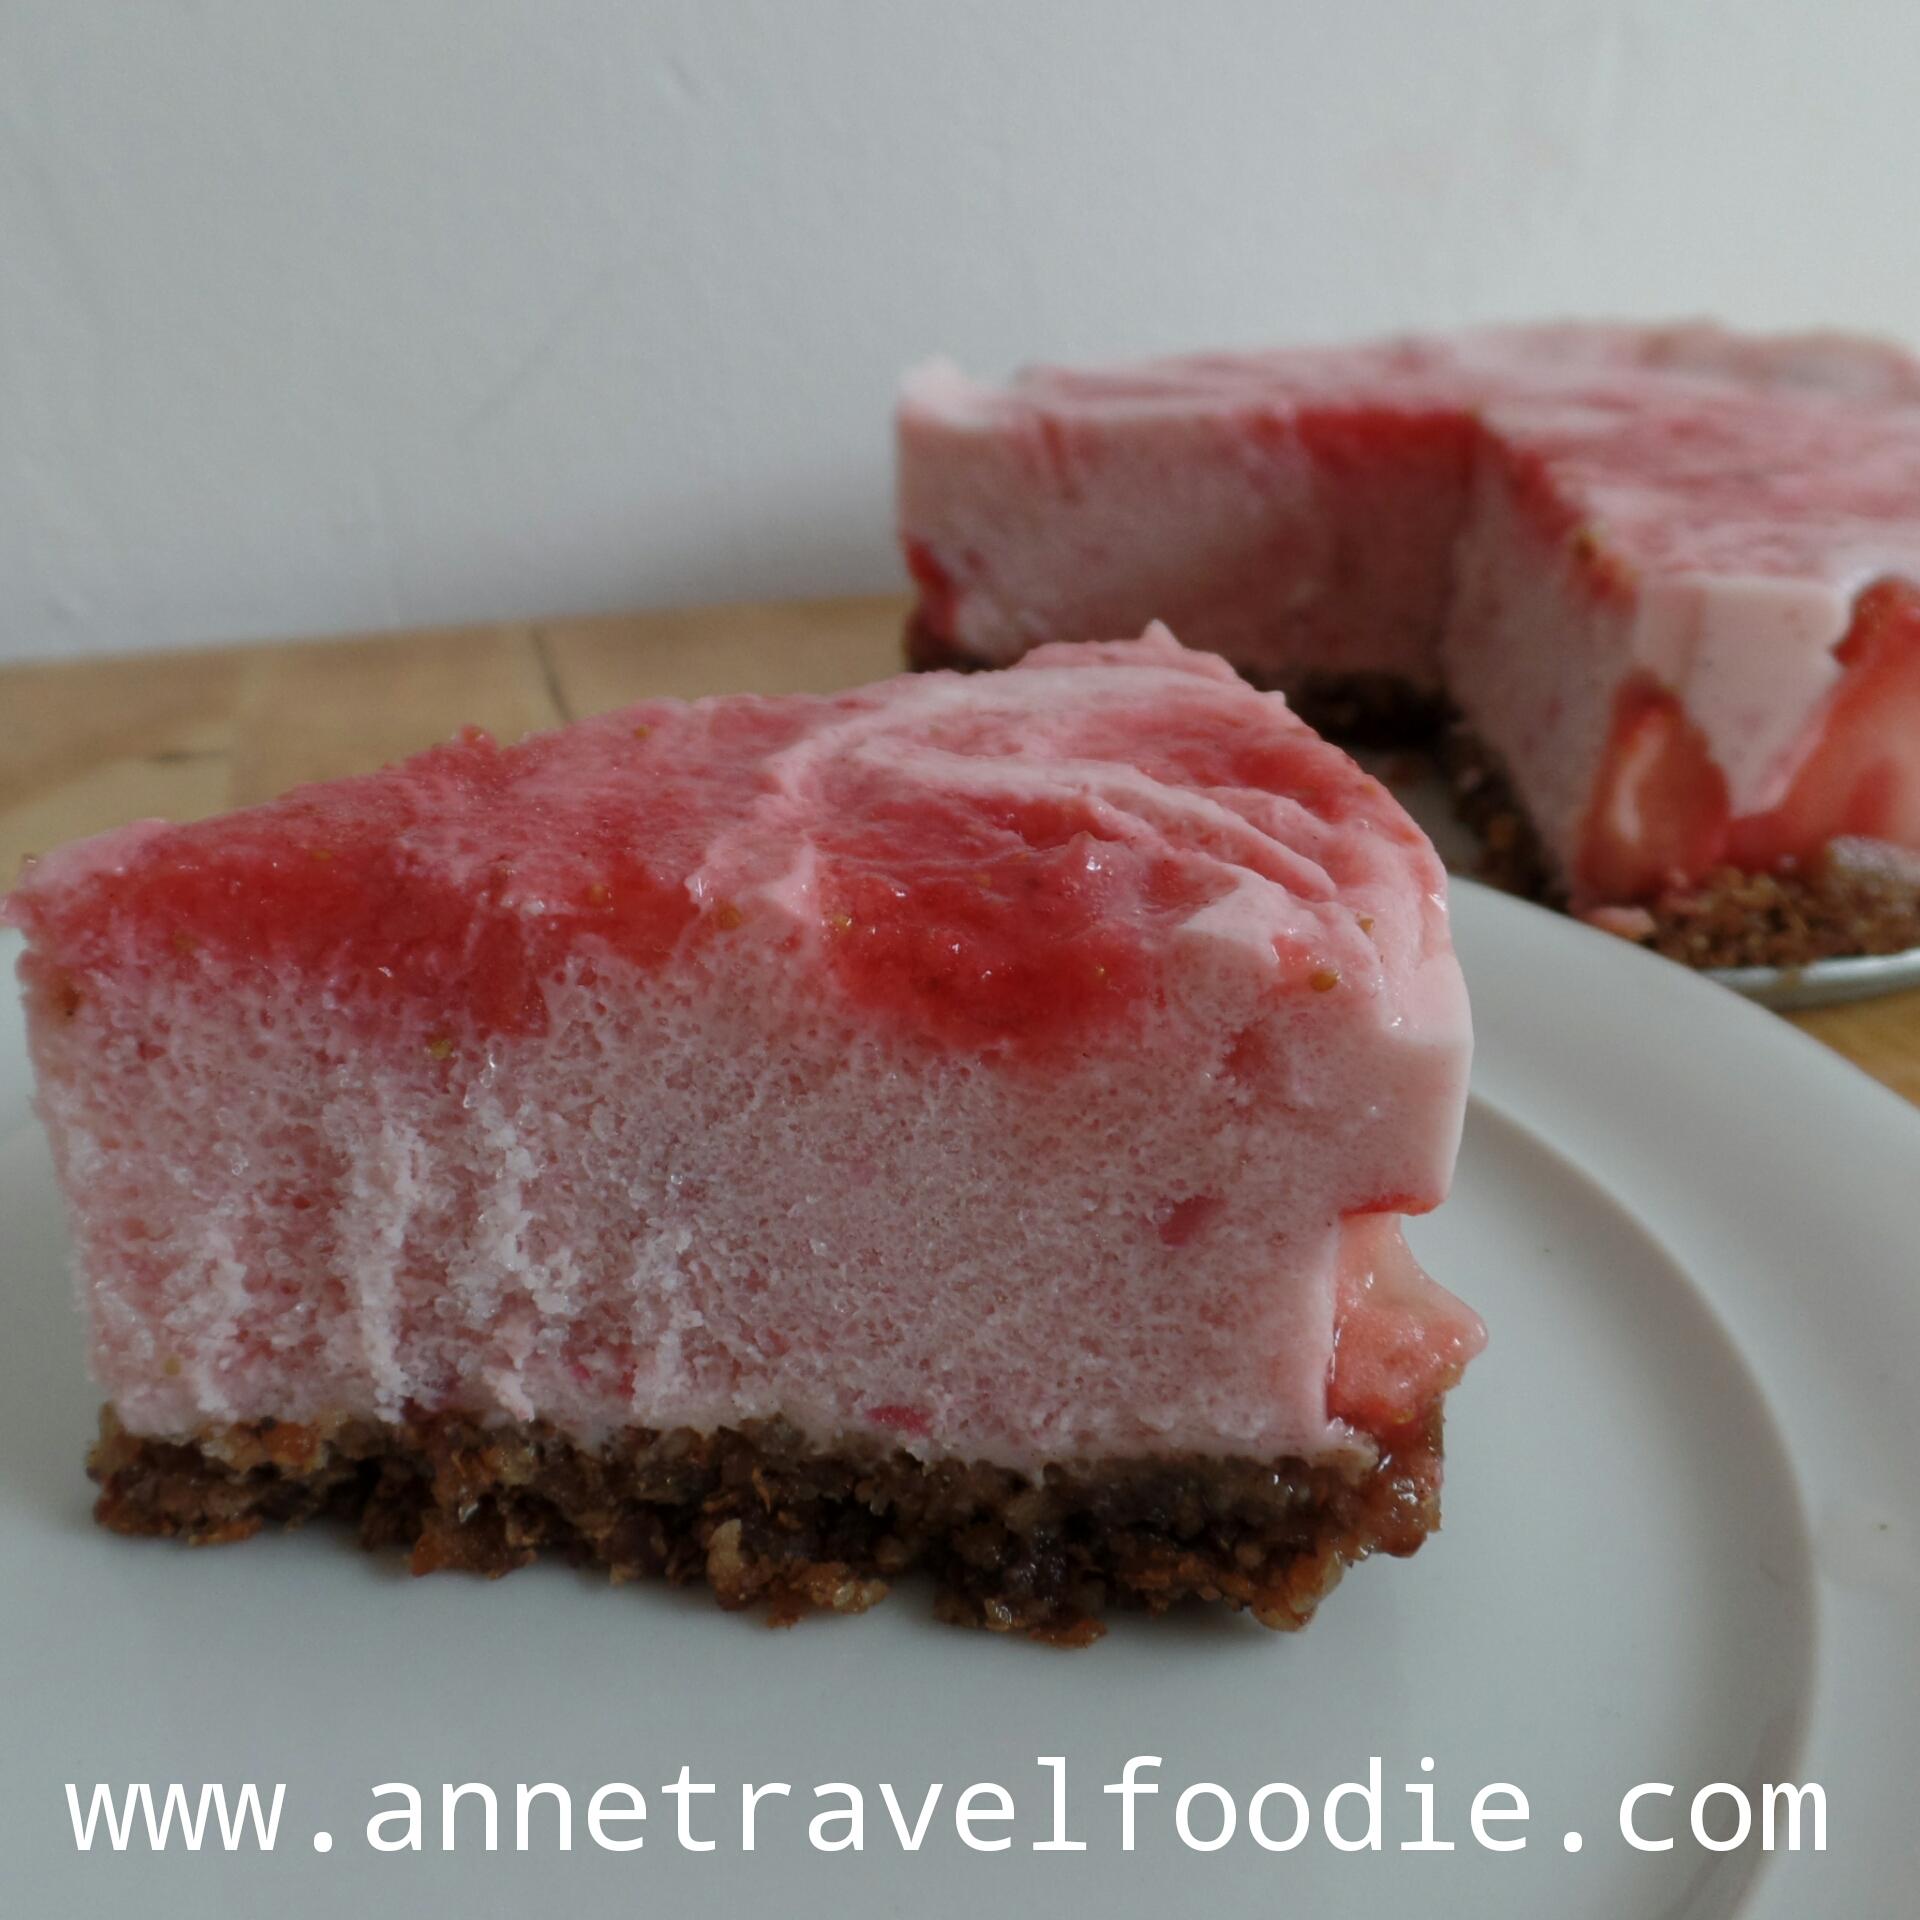 healthystrawberrycheesecake